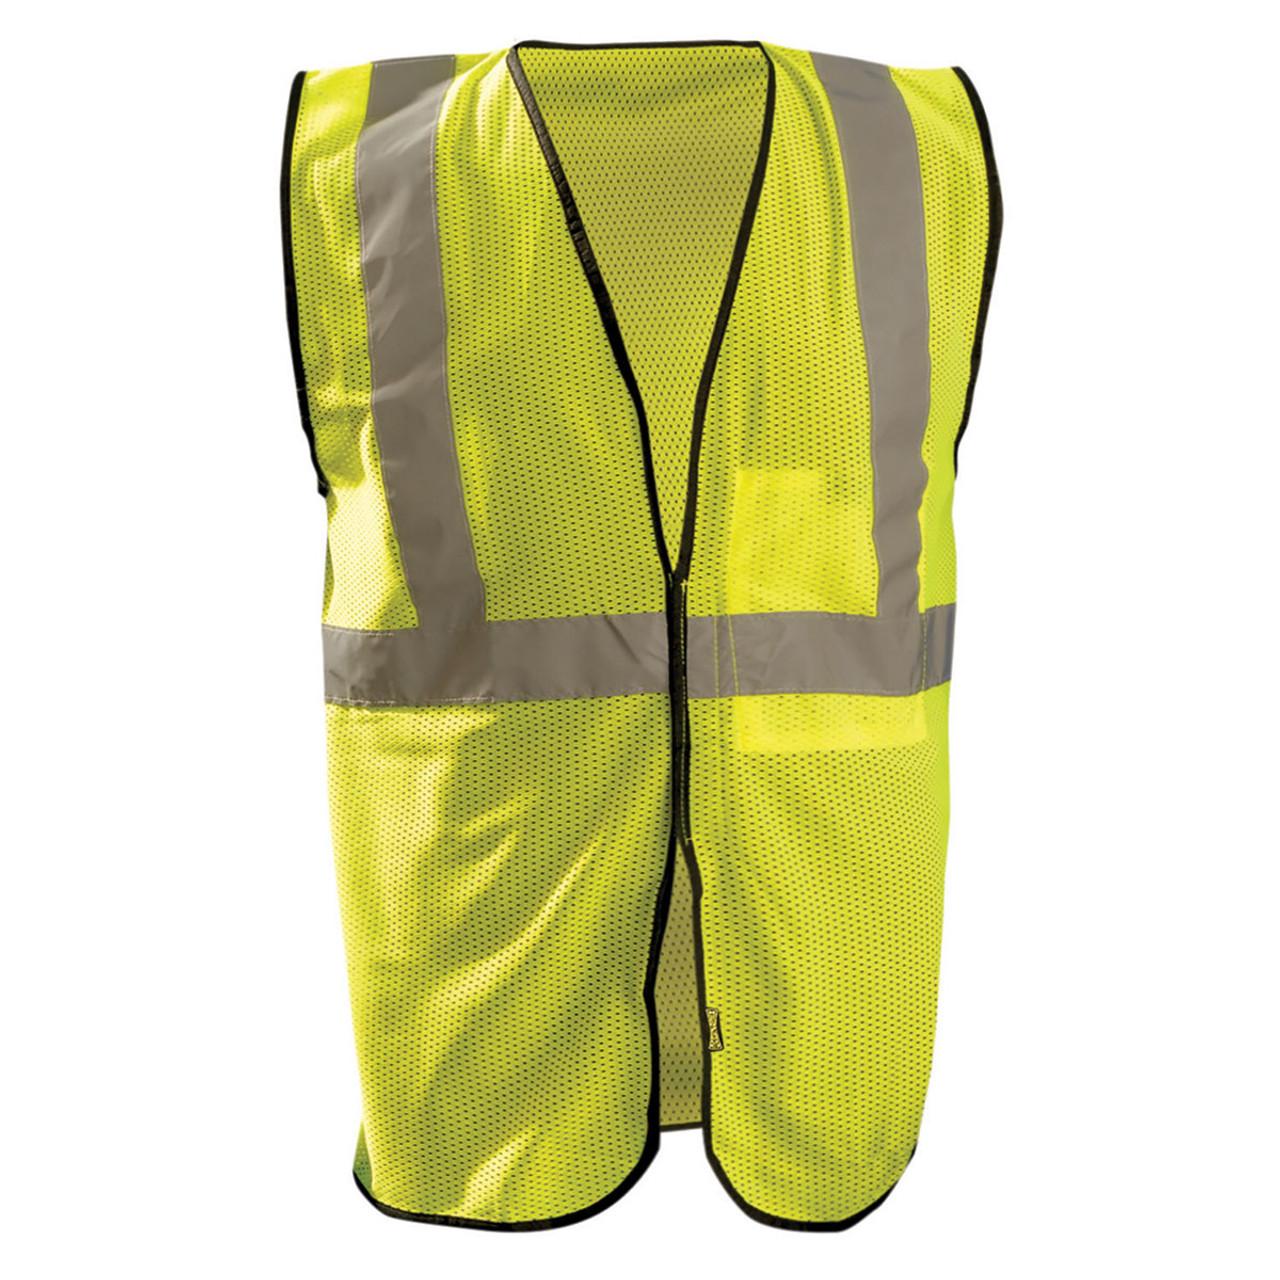 ac37edca4b6 Occunomix Class 2 Hi Vis Economy Mesh Construction Vest ECO-GC Yellow Front